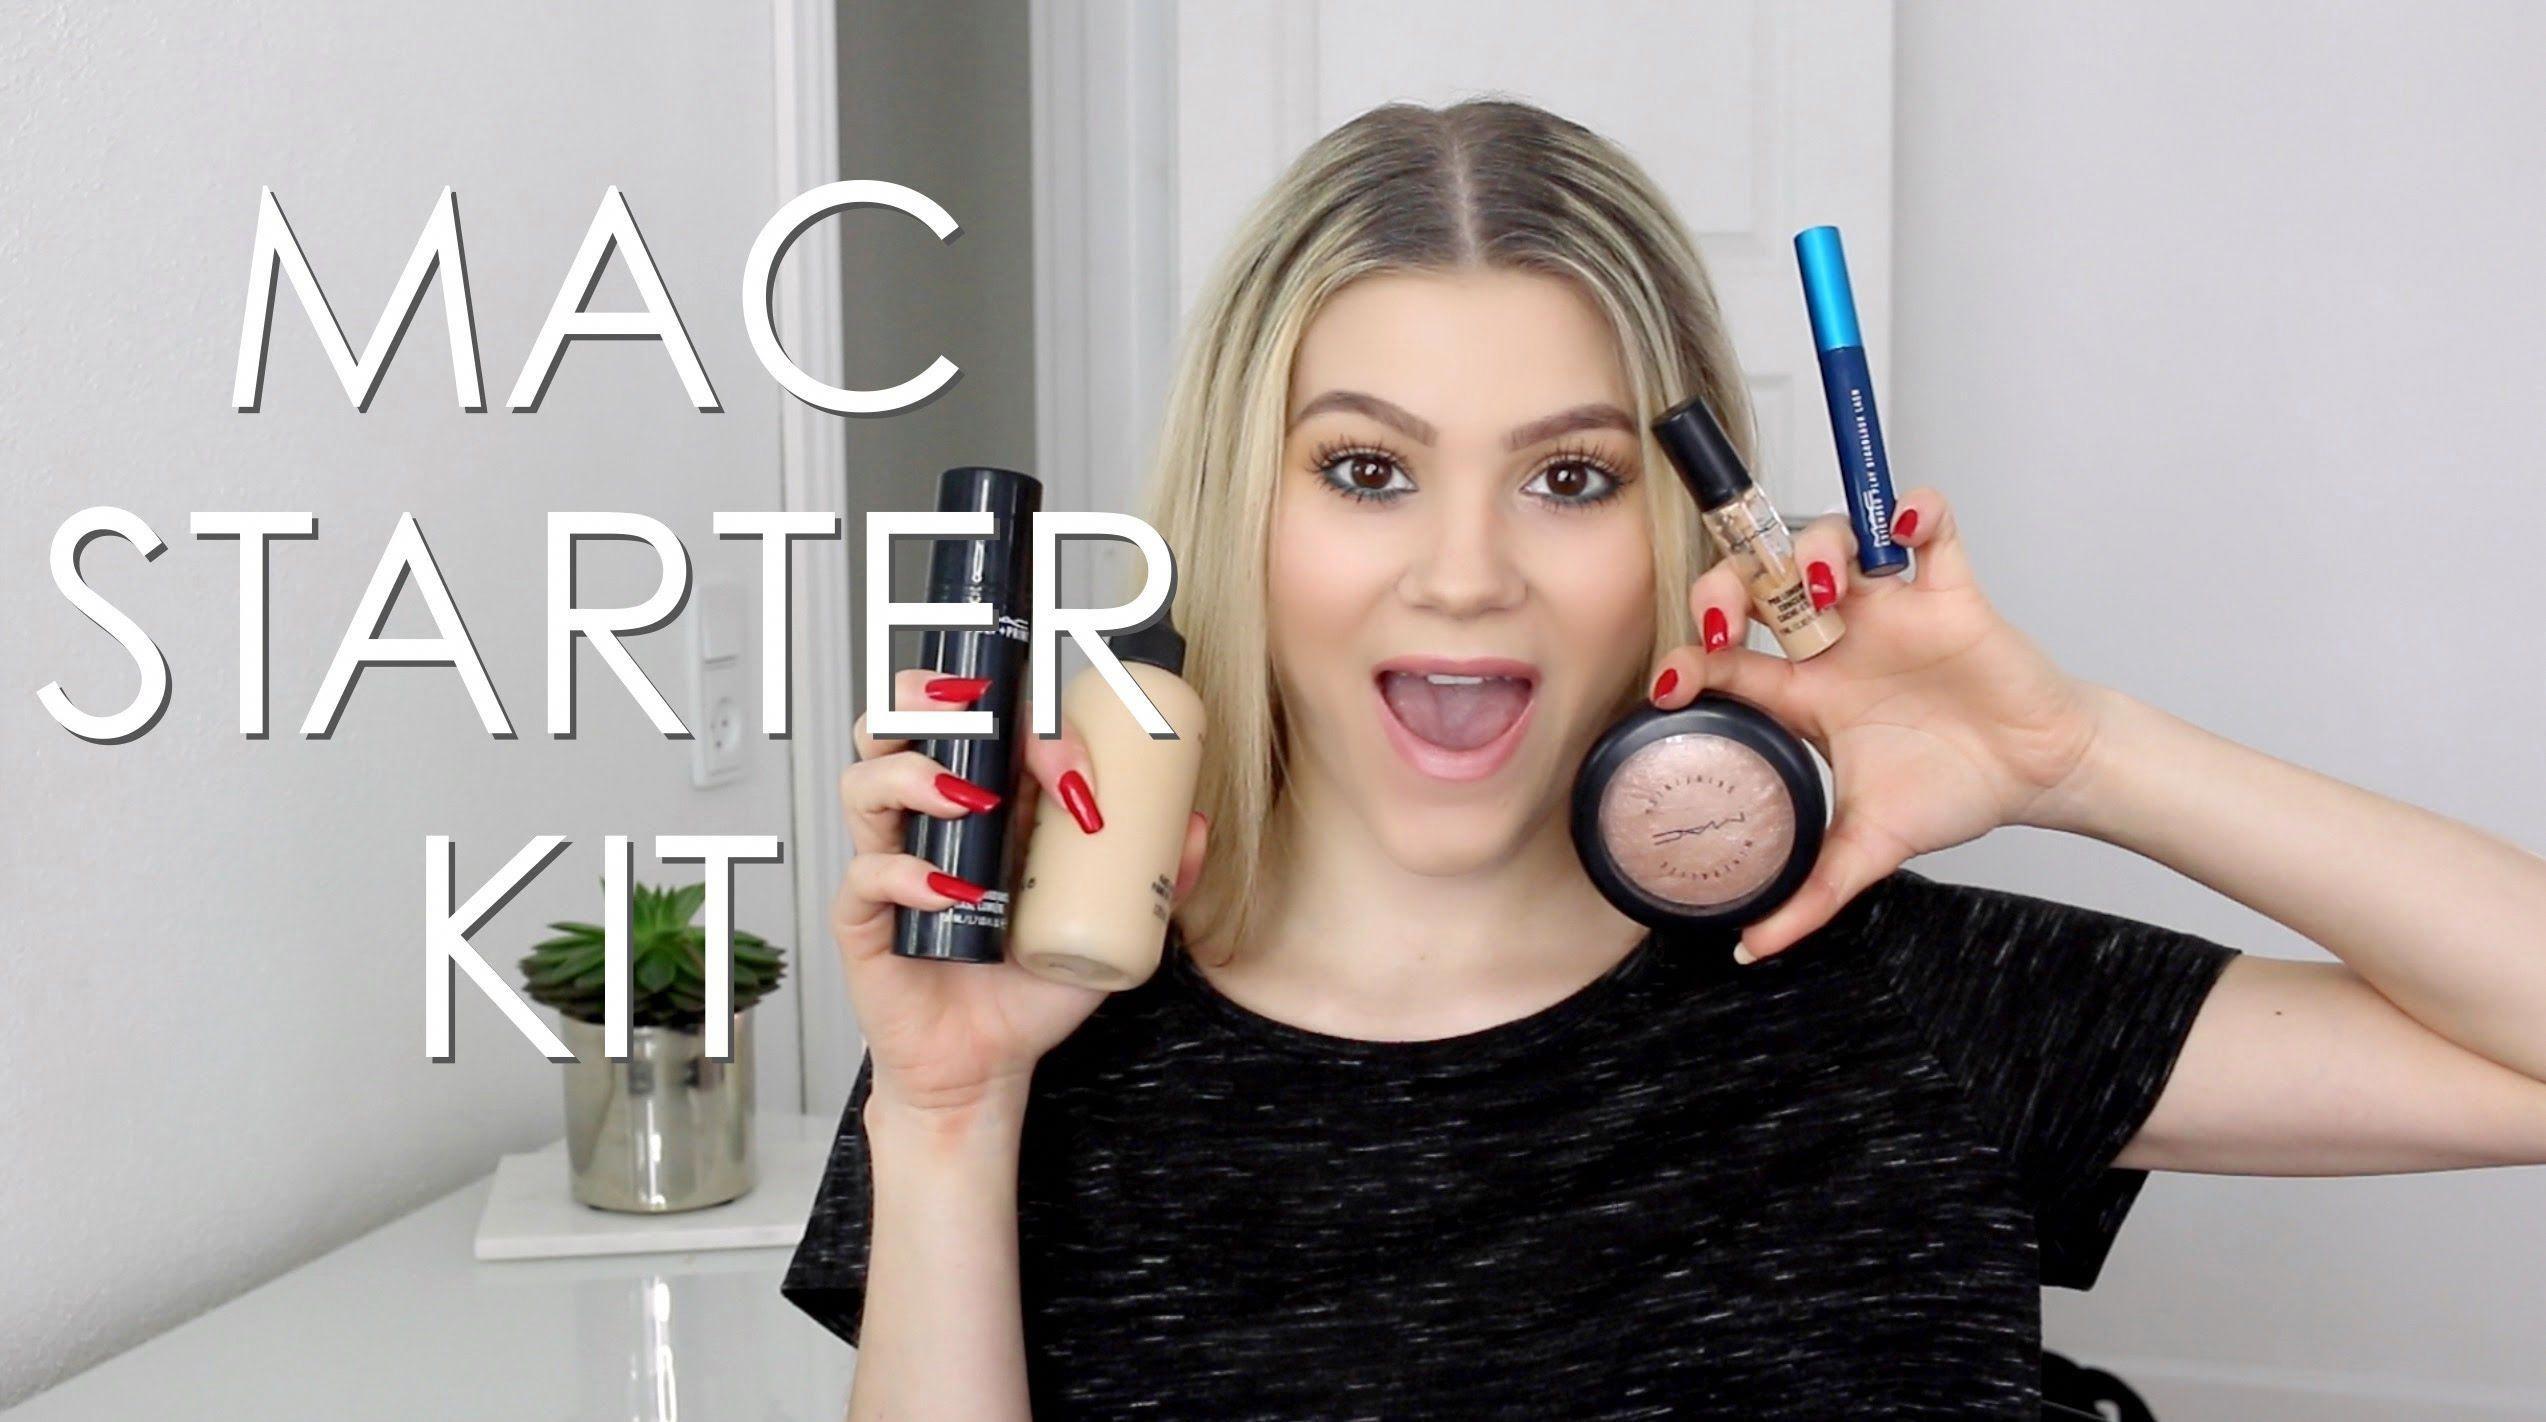 Best deals.. musthavemacmakeup Makeup starter kit